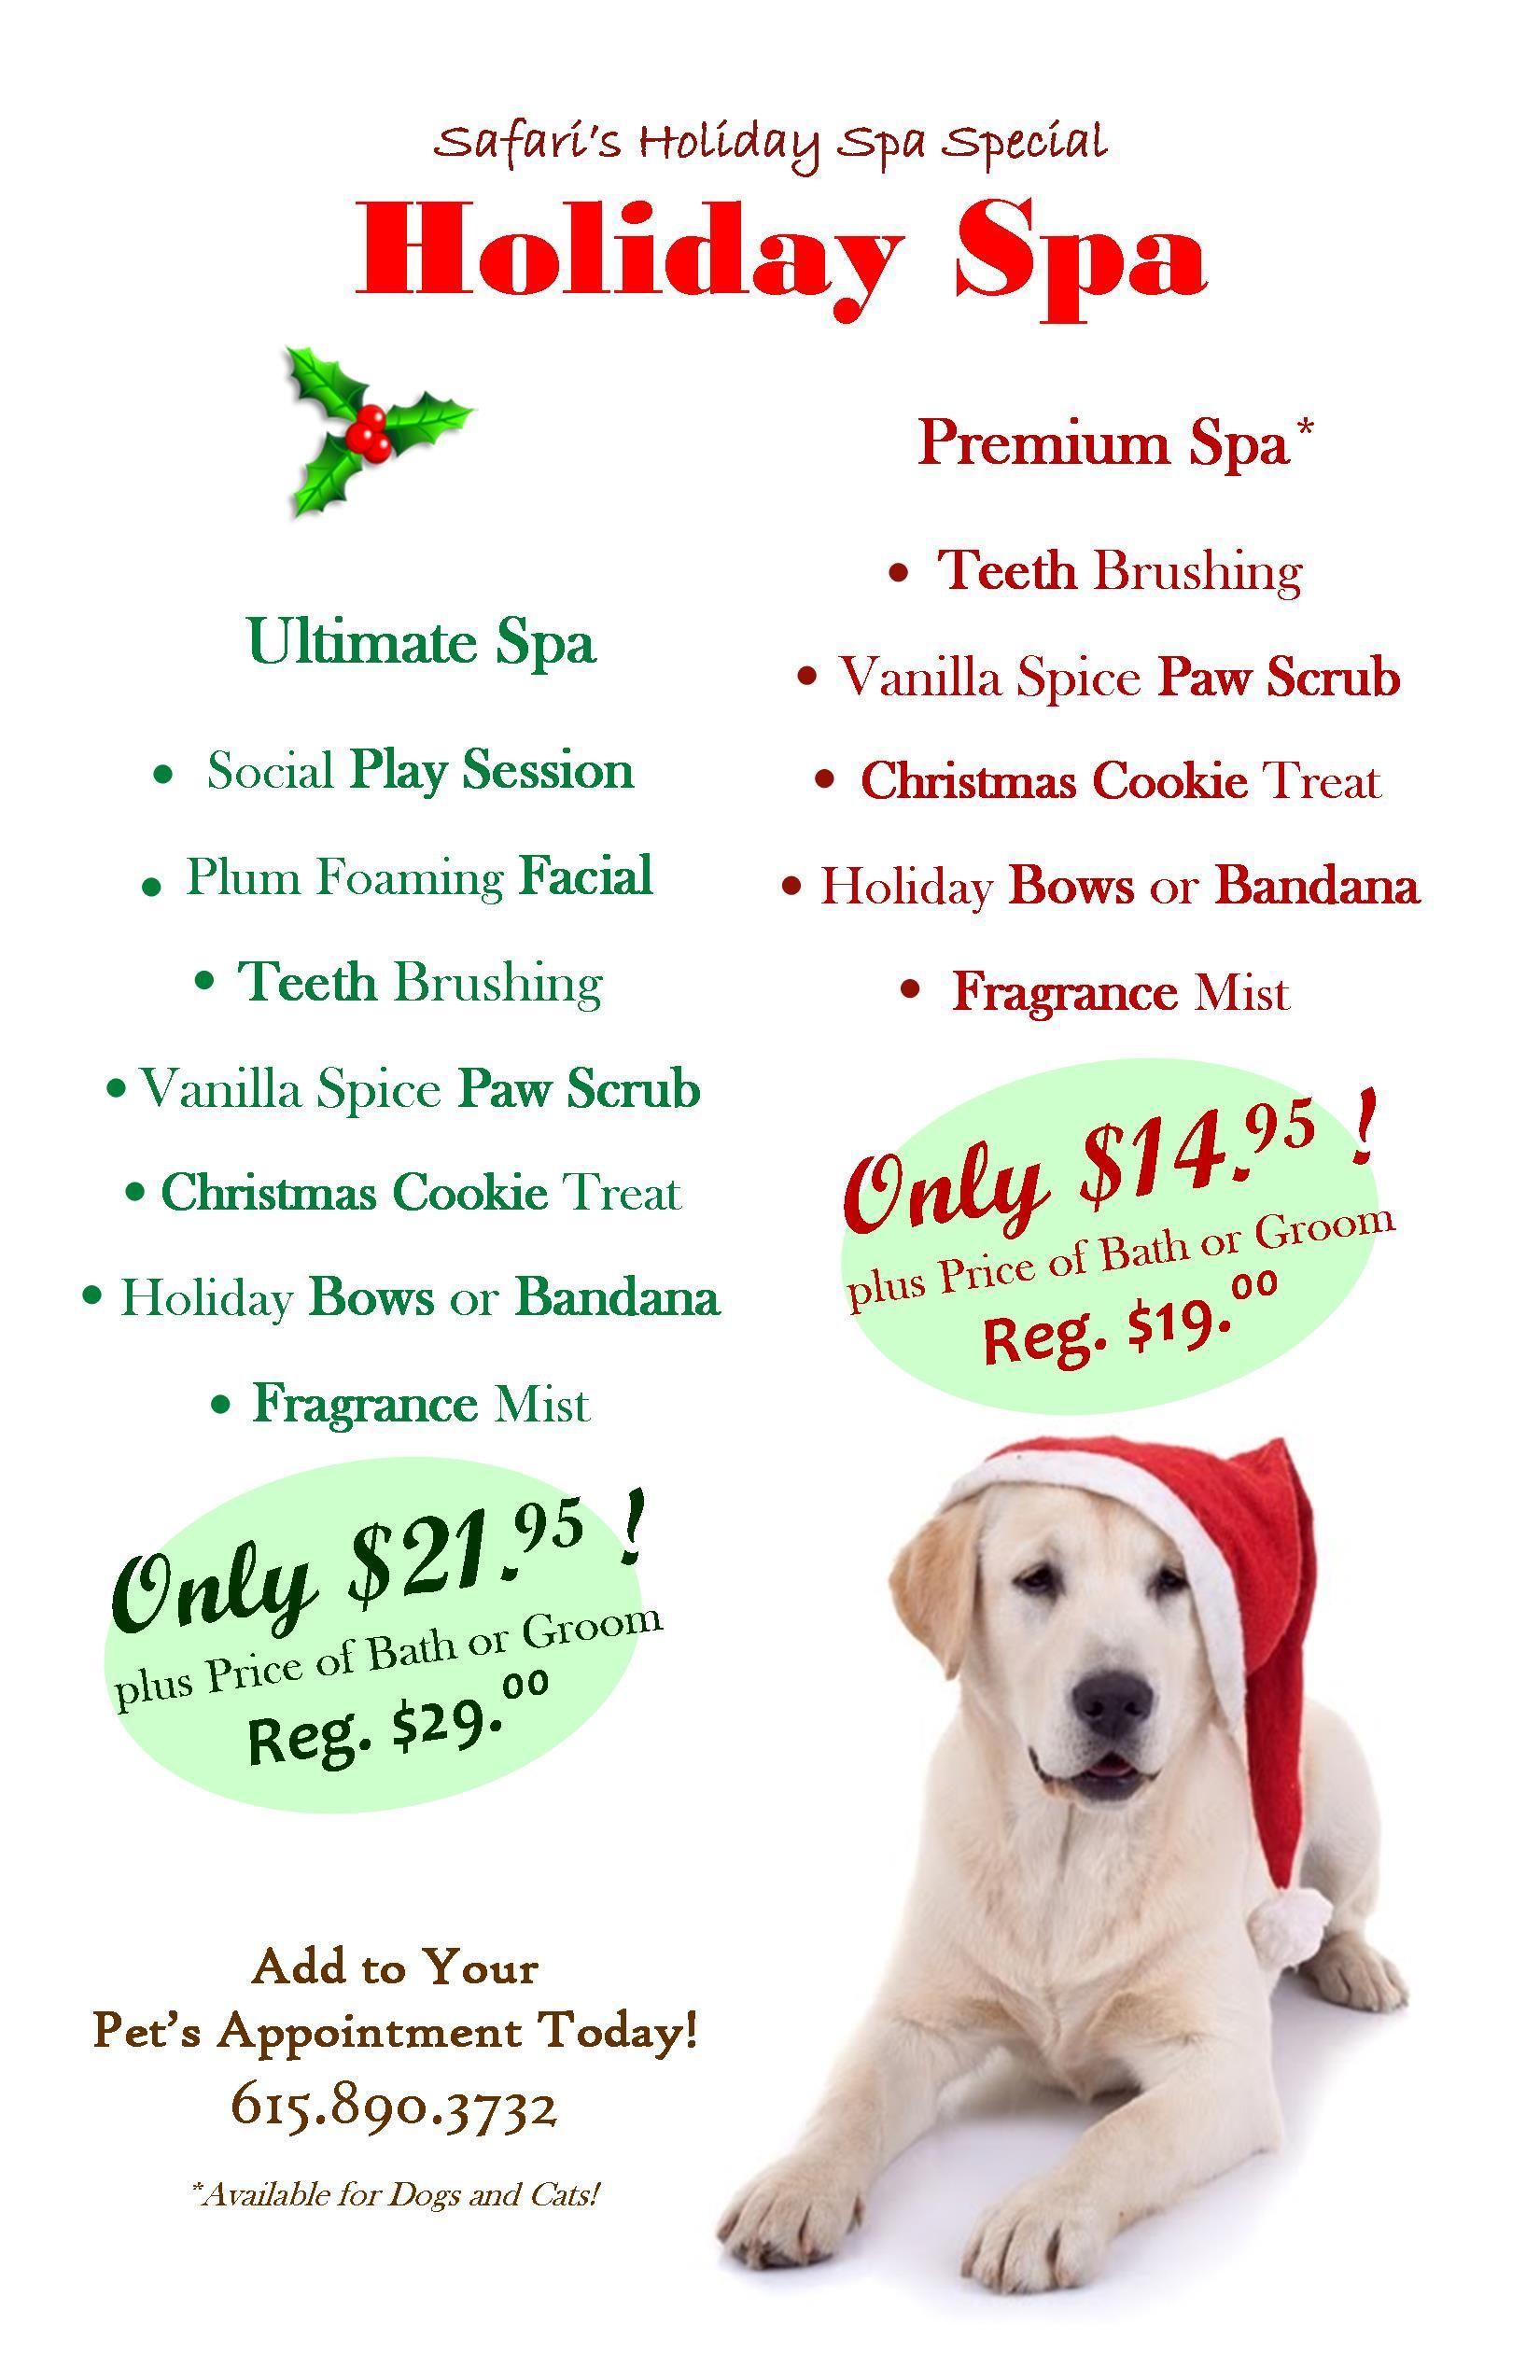 Dog Grooming Safari Pet Resort Murfreesboro Tn Pet Resort Dog Grooming Dog Grooming Business